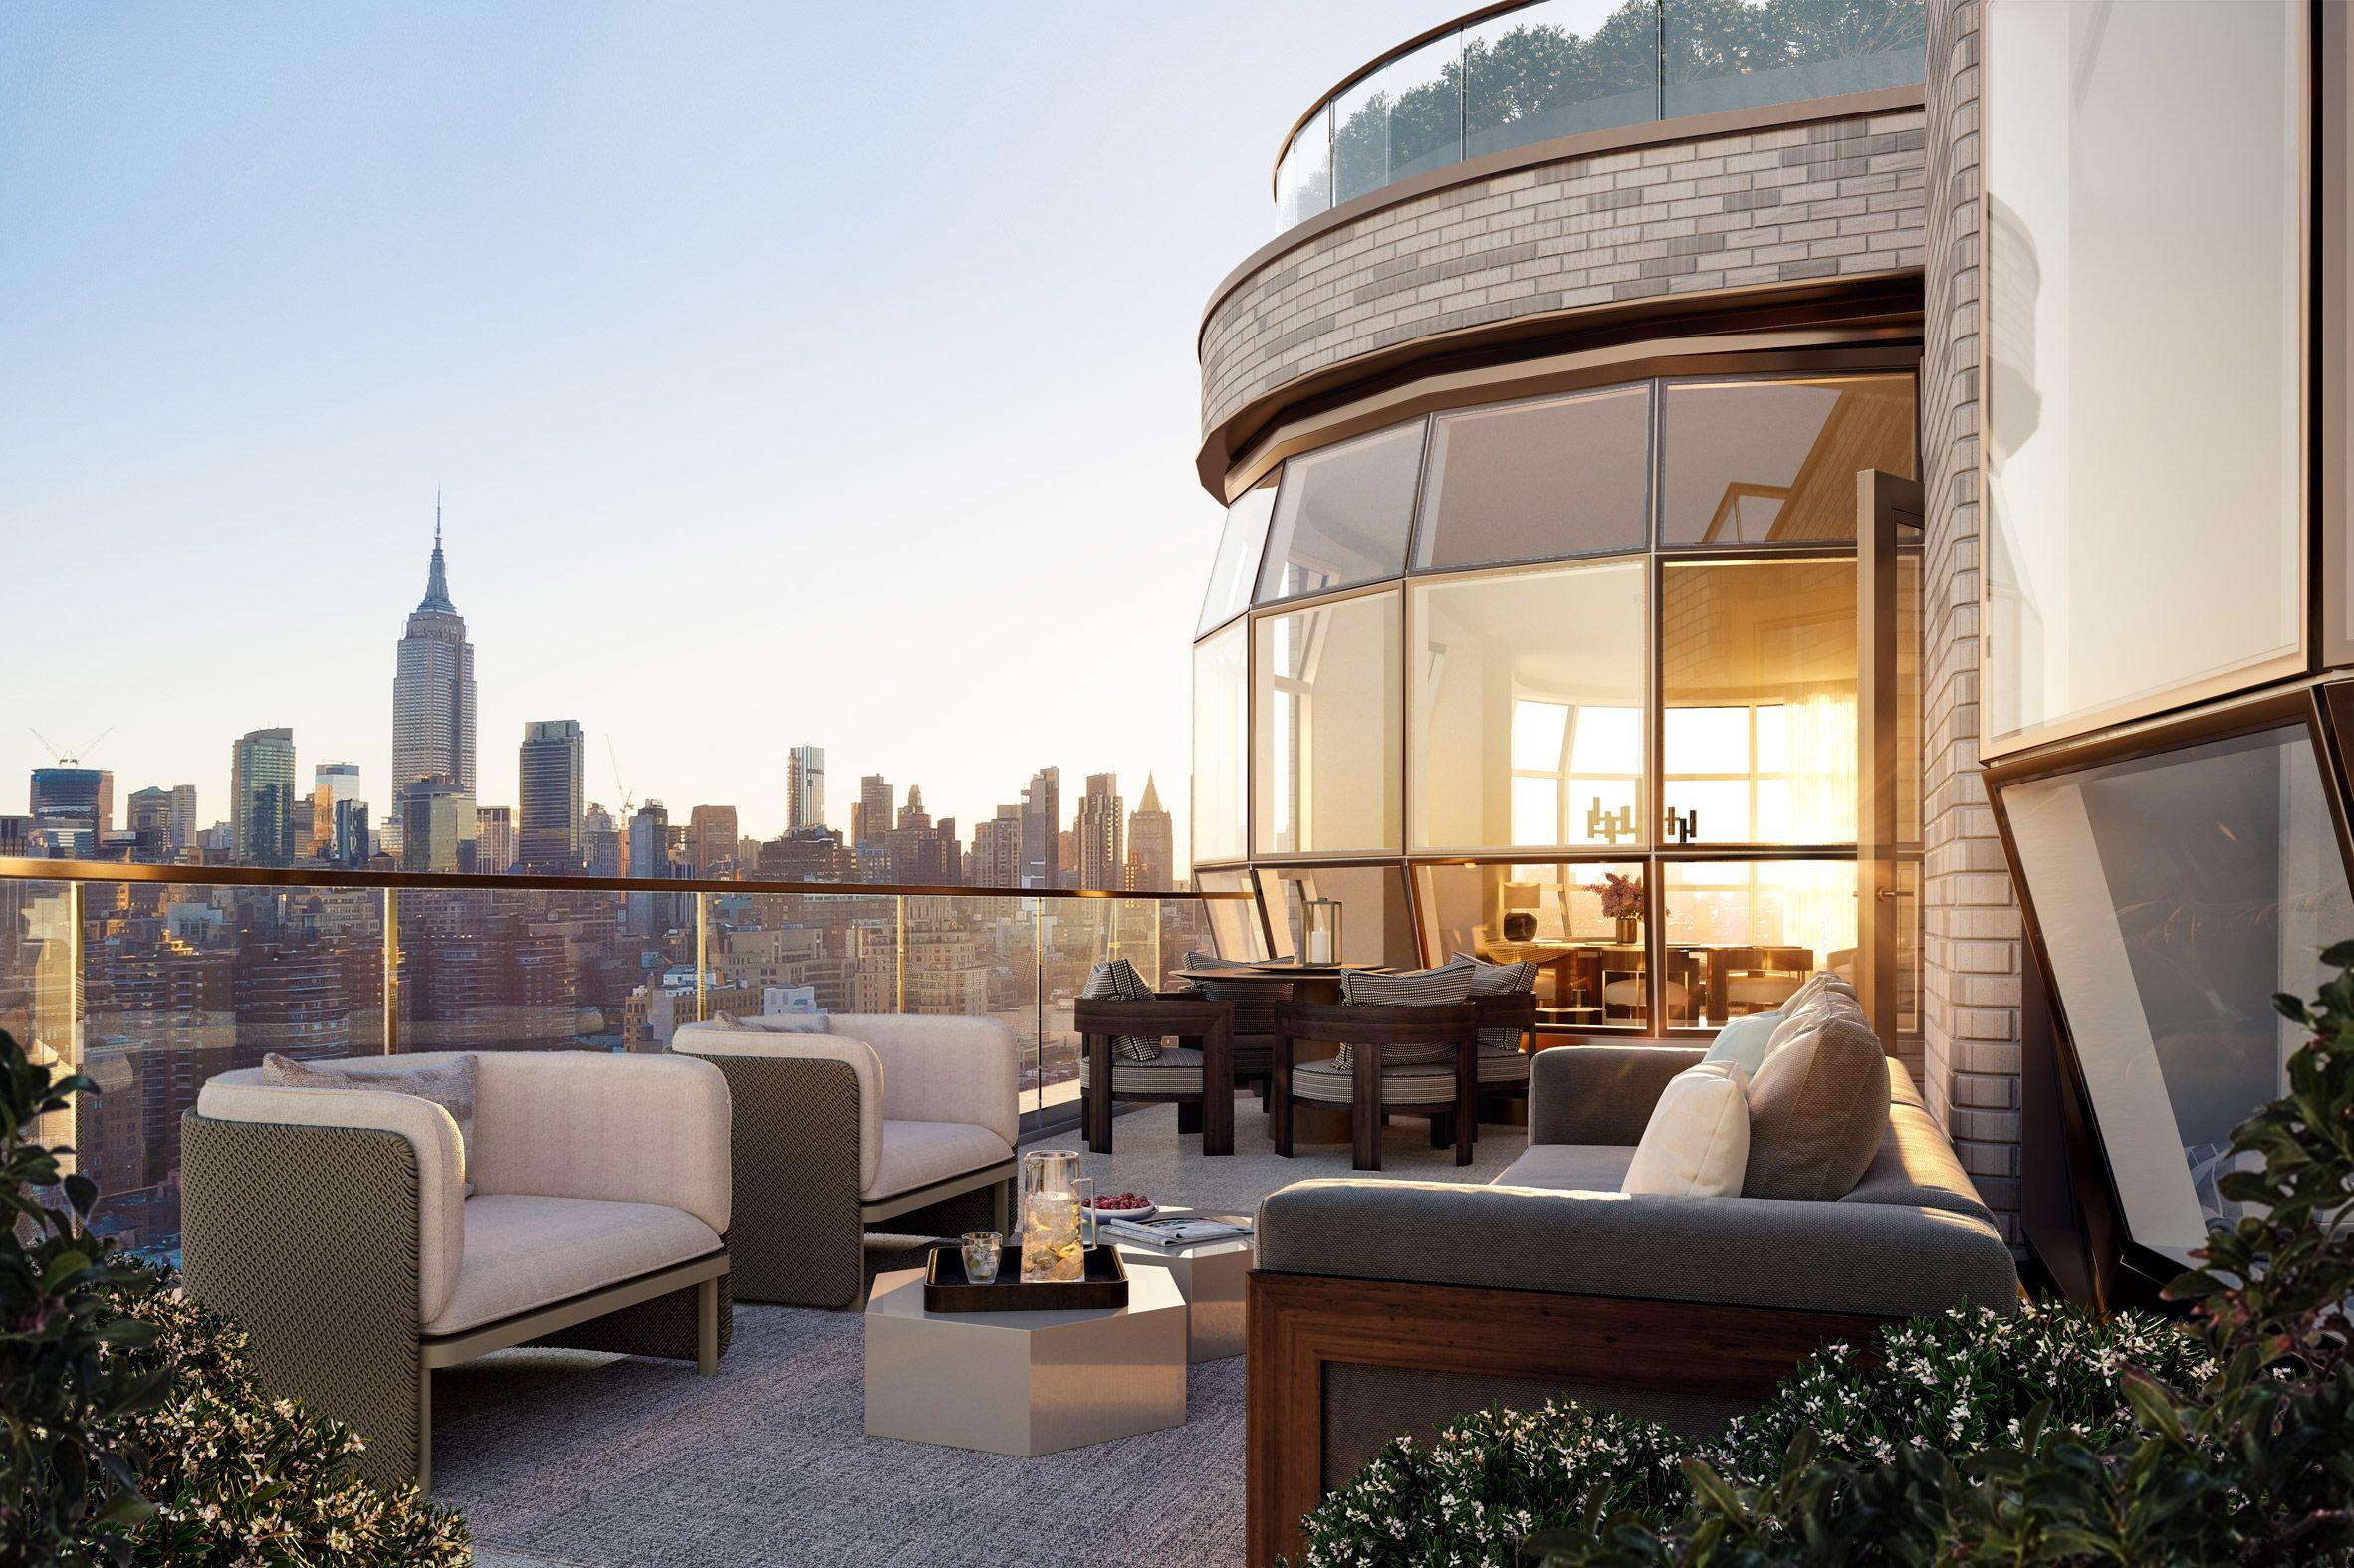 Lantern House By Thomas Heatherwick Residential Building Architecture Window Seat Design